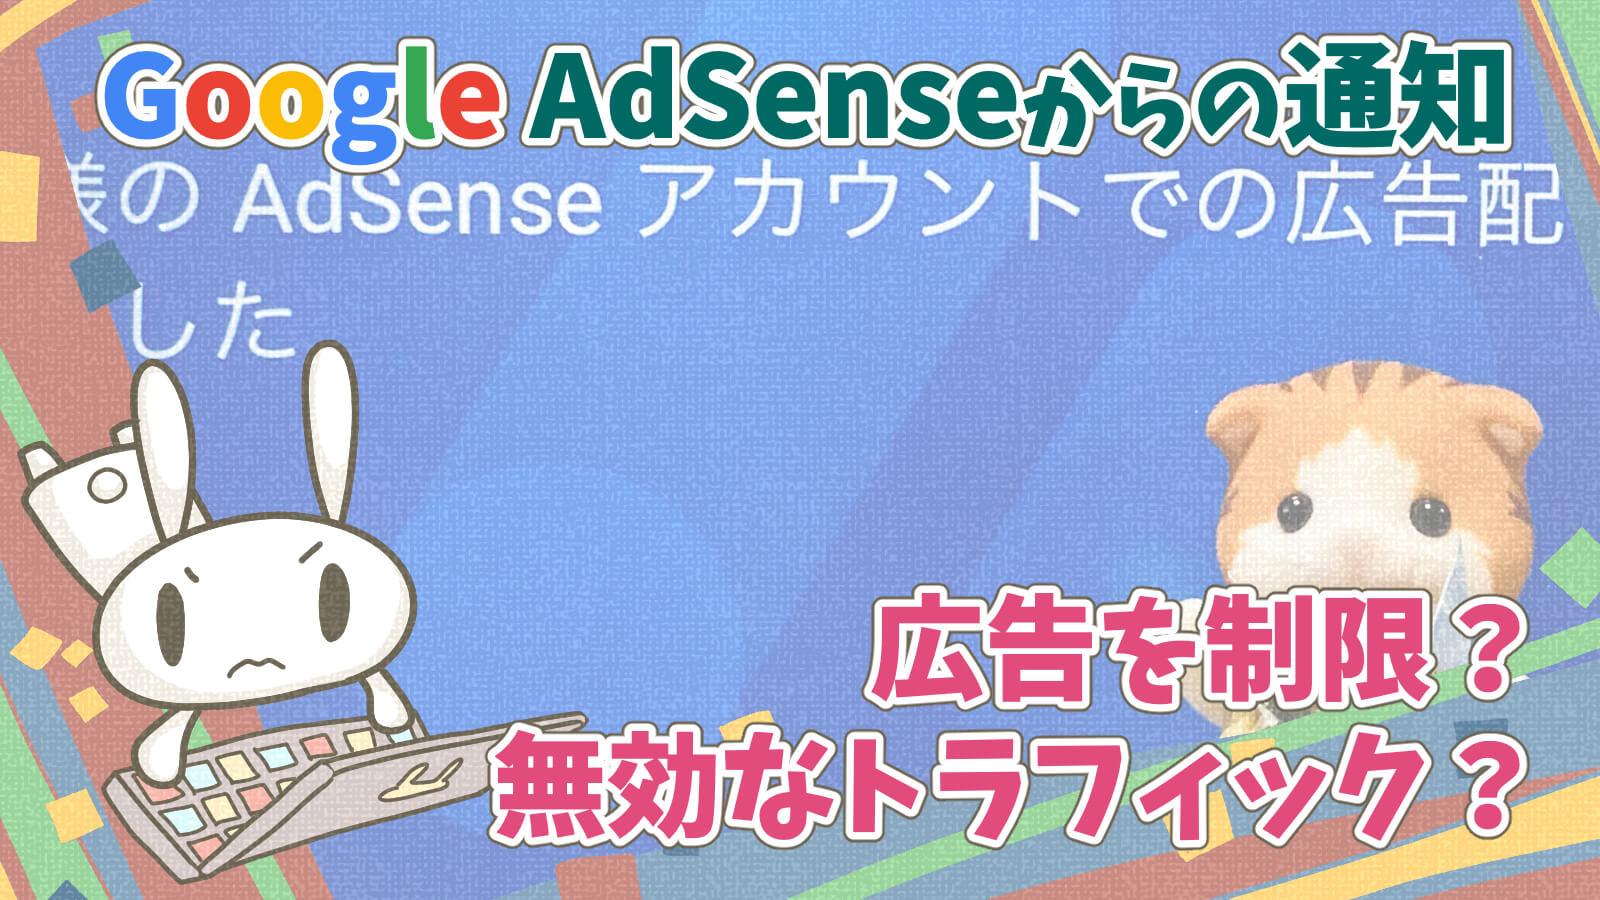 GoogleAdSenseの無効なトラフィックの問題により現在制限されています